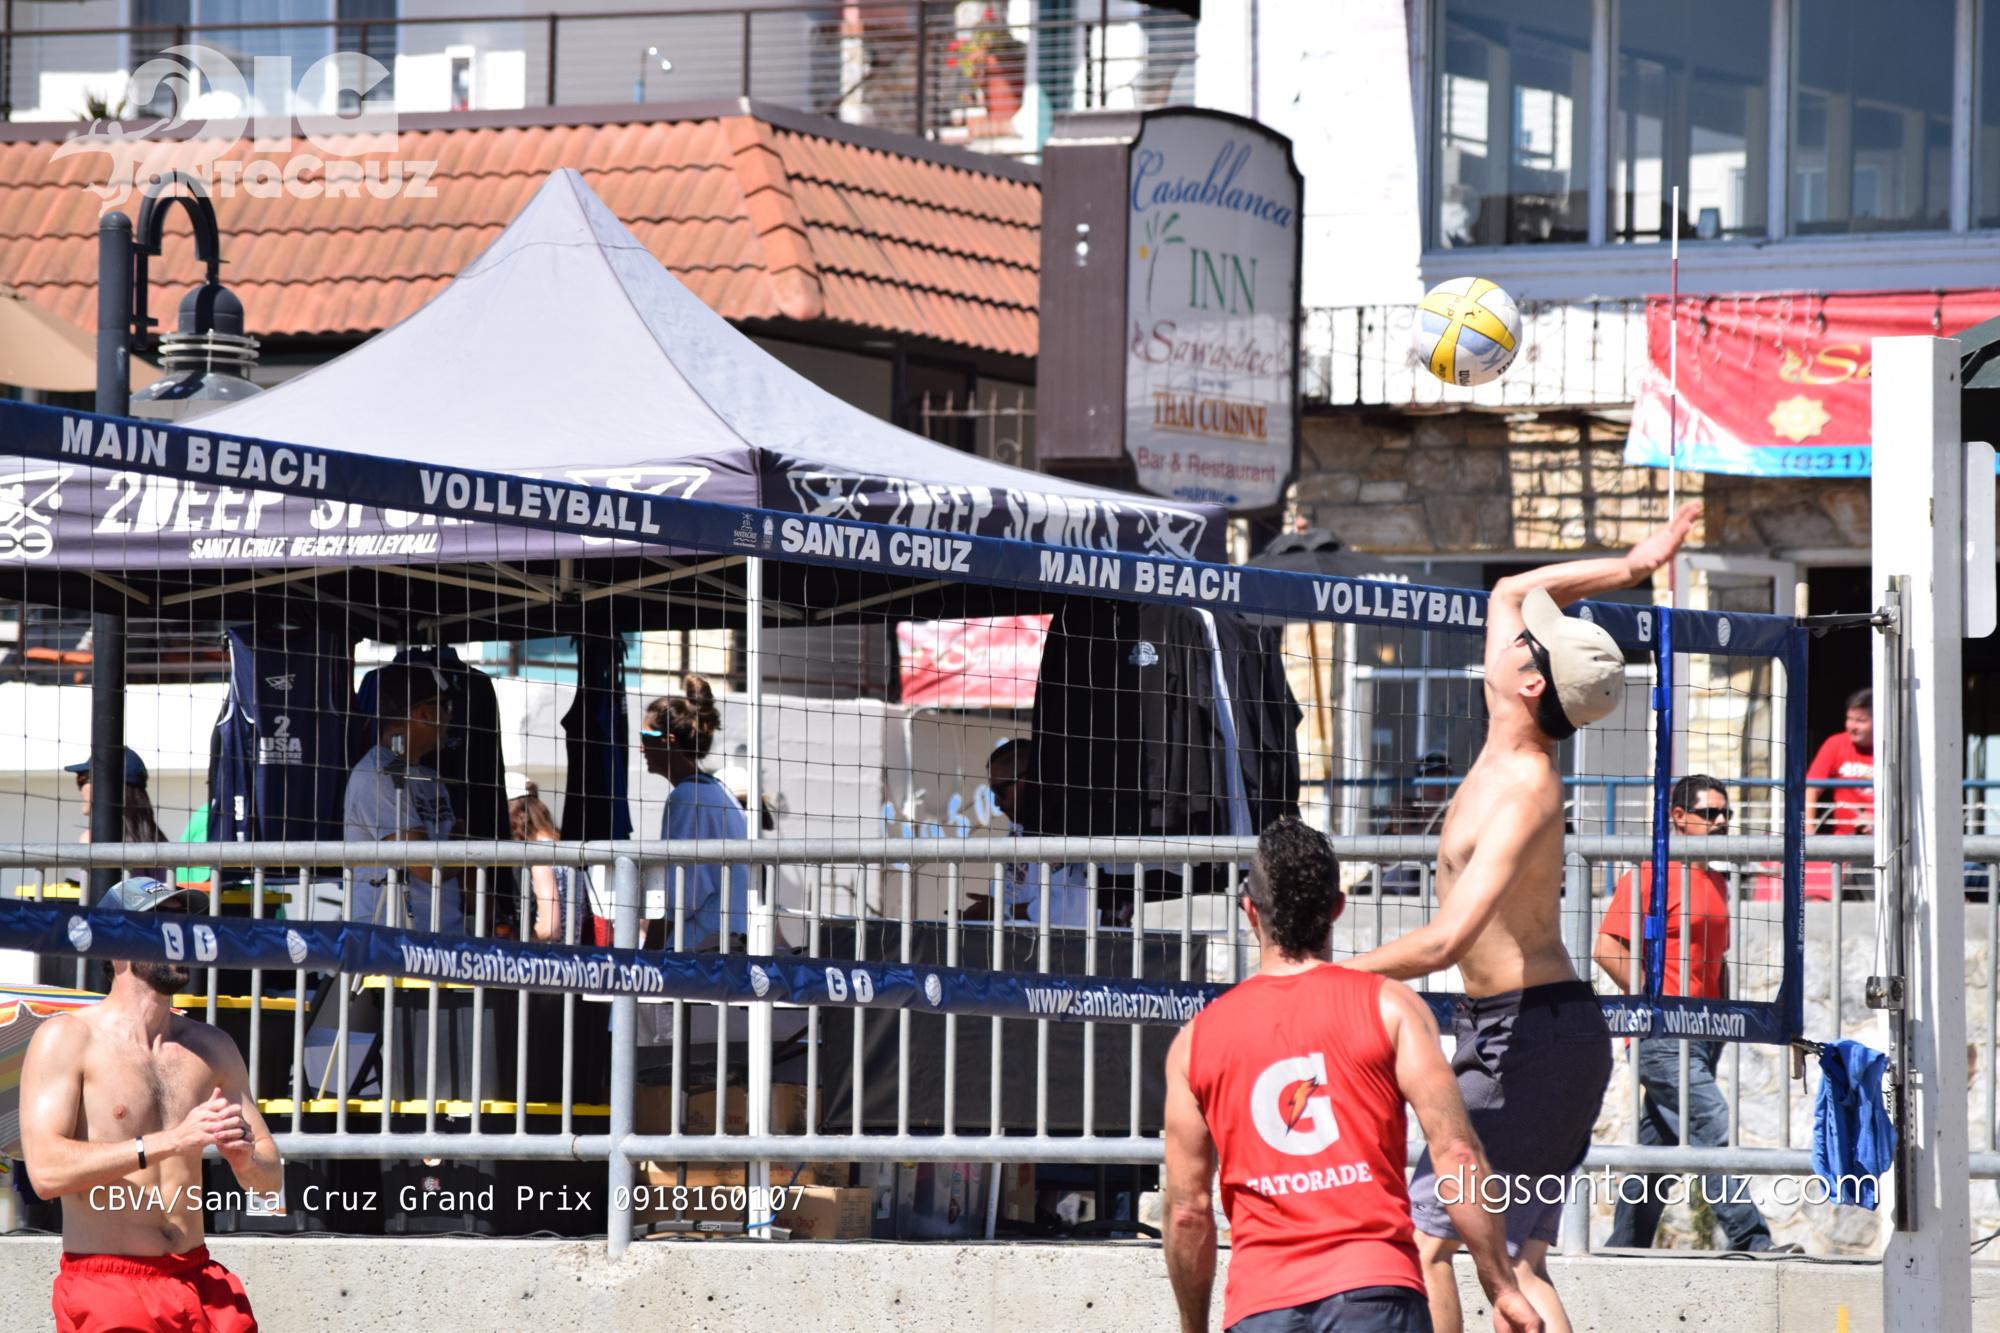 9.18.16 Santa Cruz Grand Prix 107.jpg